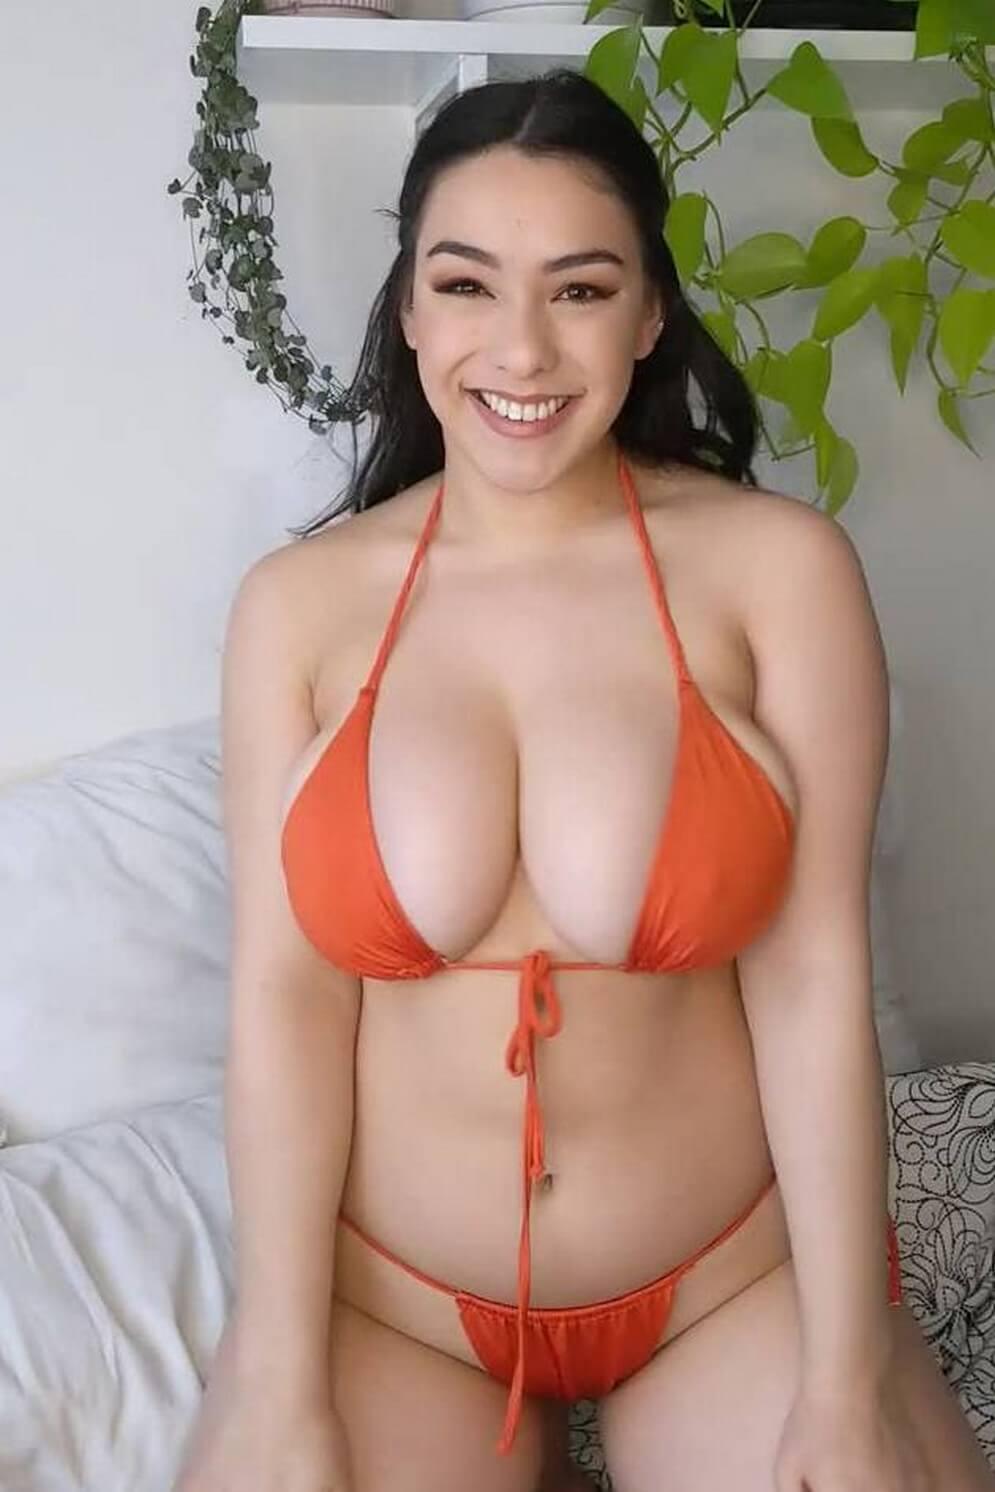 Vyzuba Big Tits Blog: Enjoy amazing big tits reveal from